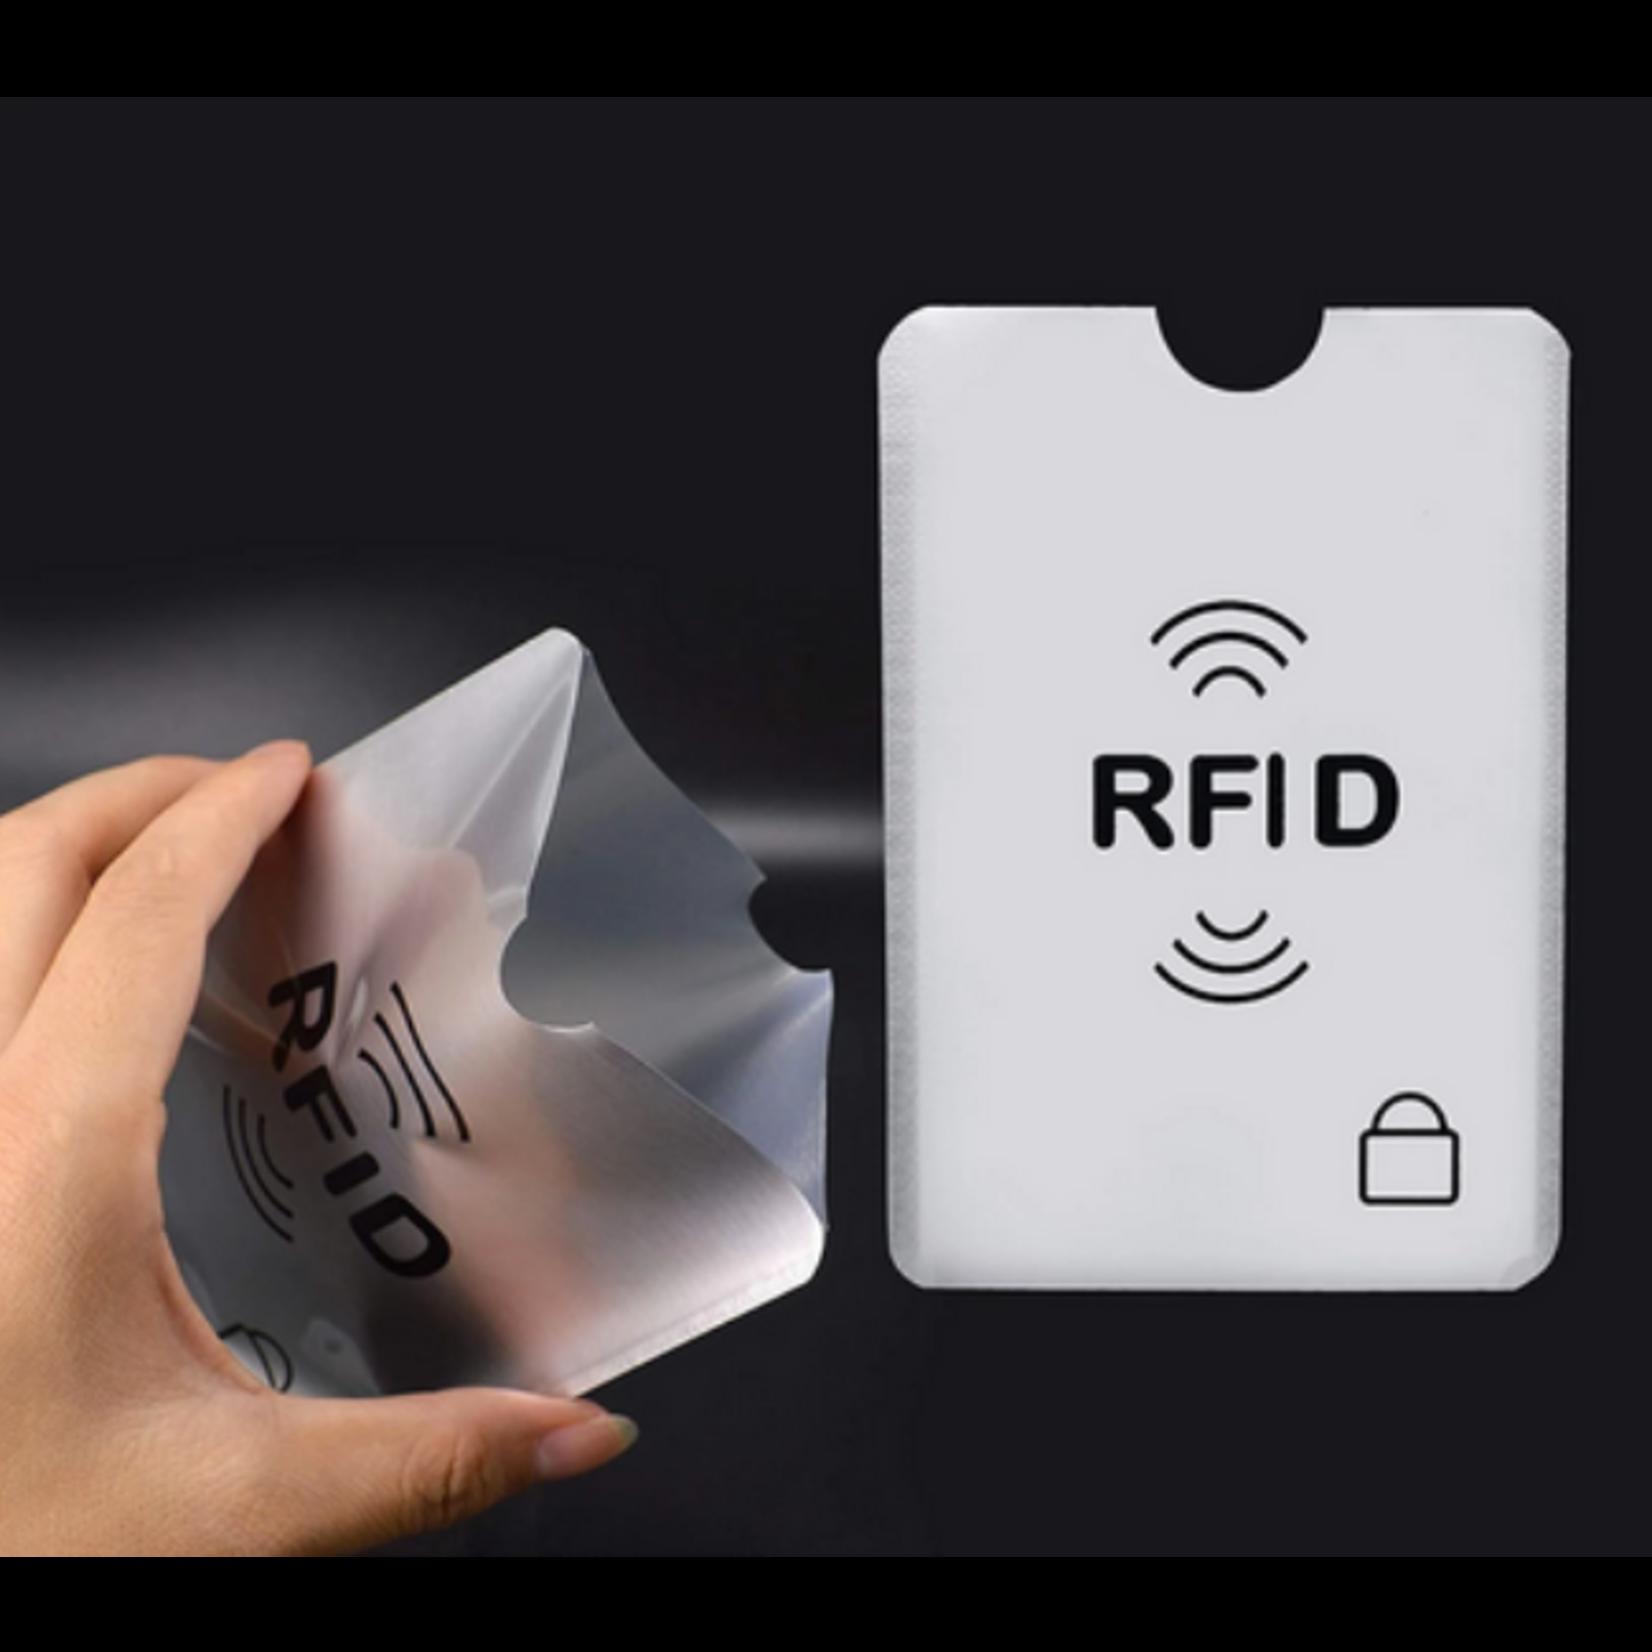 ALI PASSPORT SLEEVE RFID PROTECTION